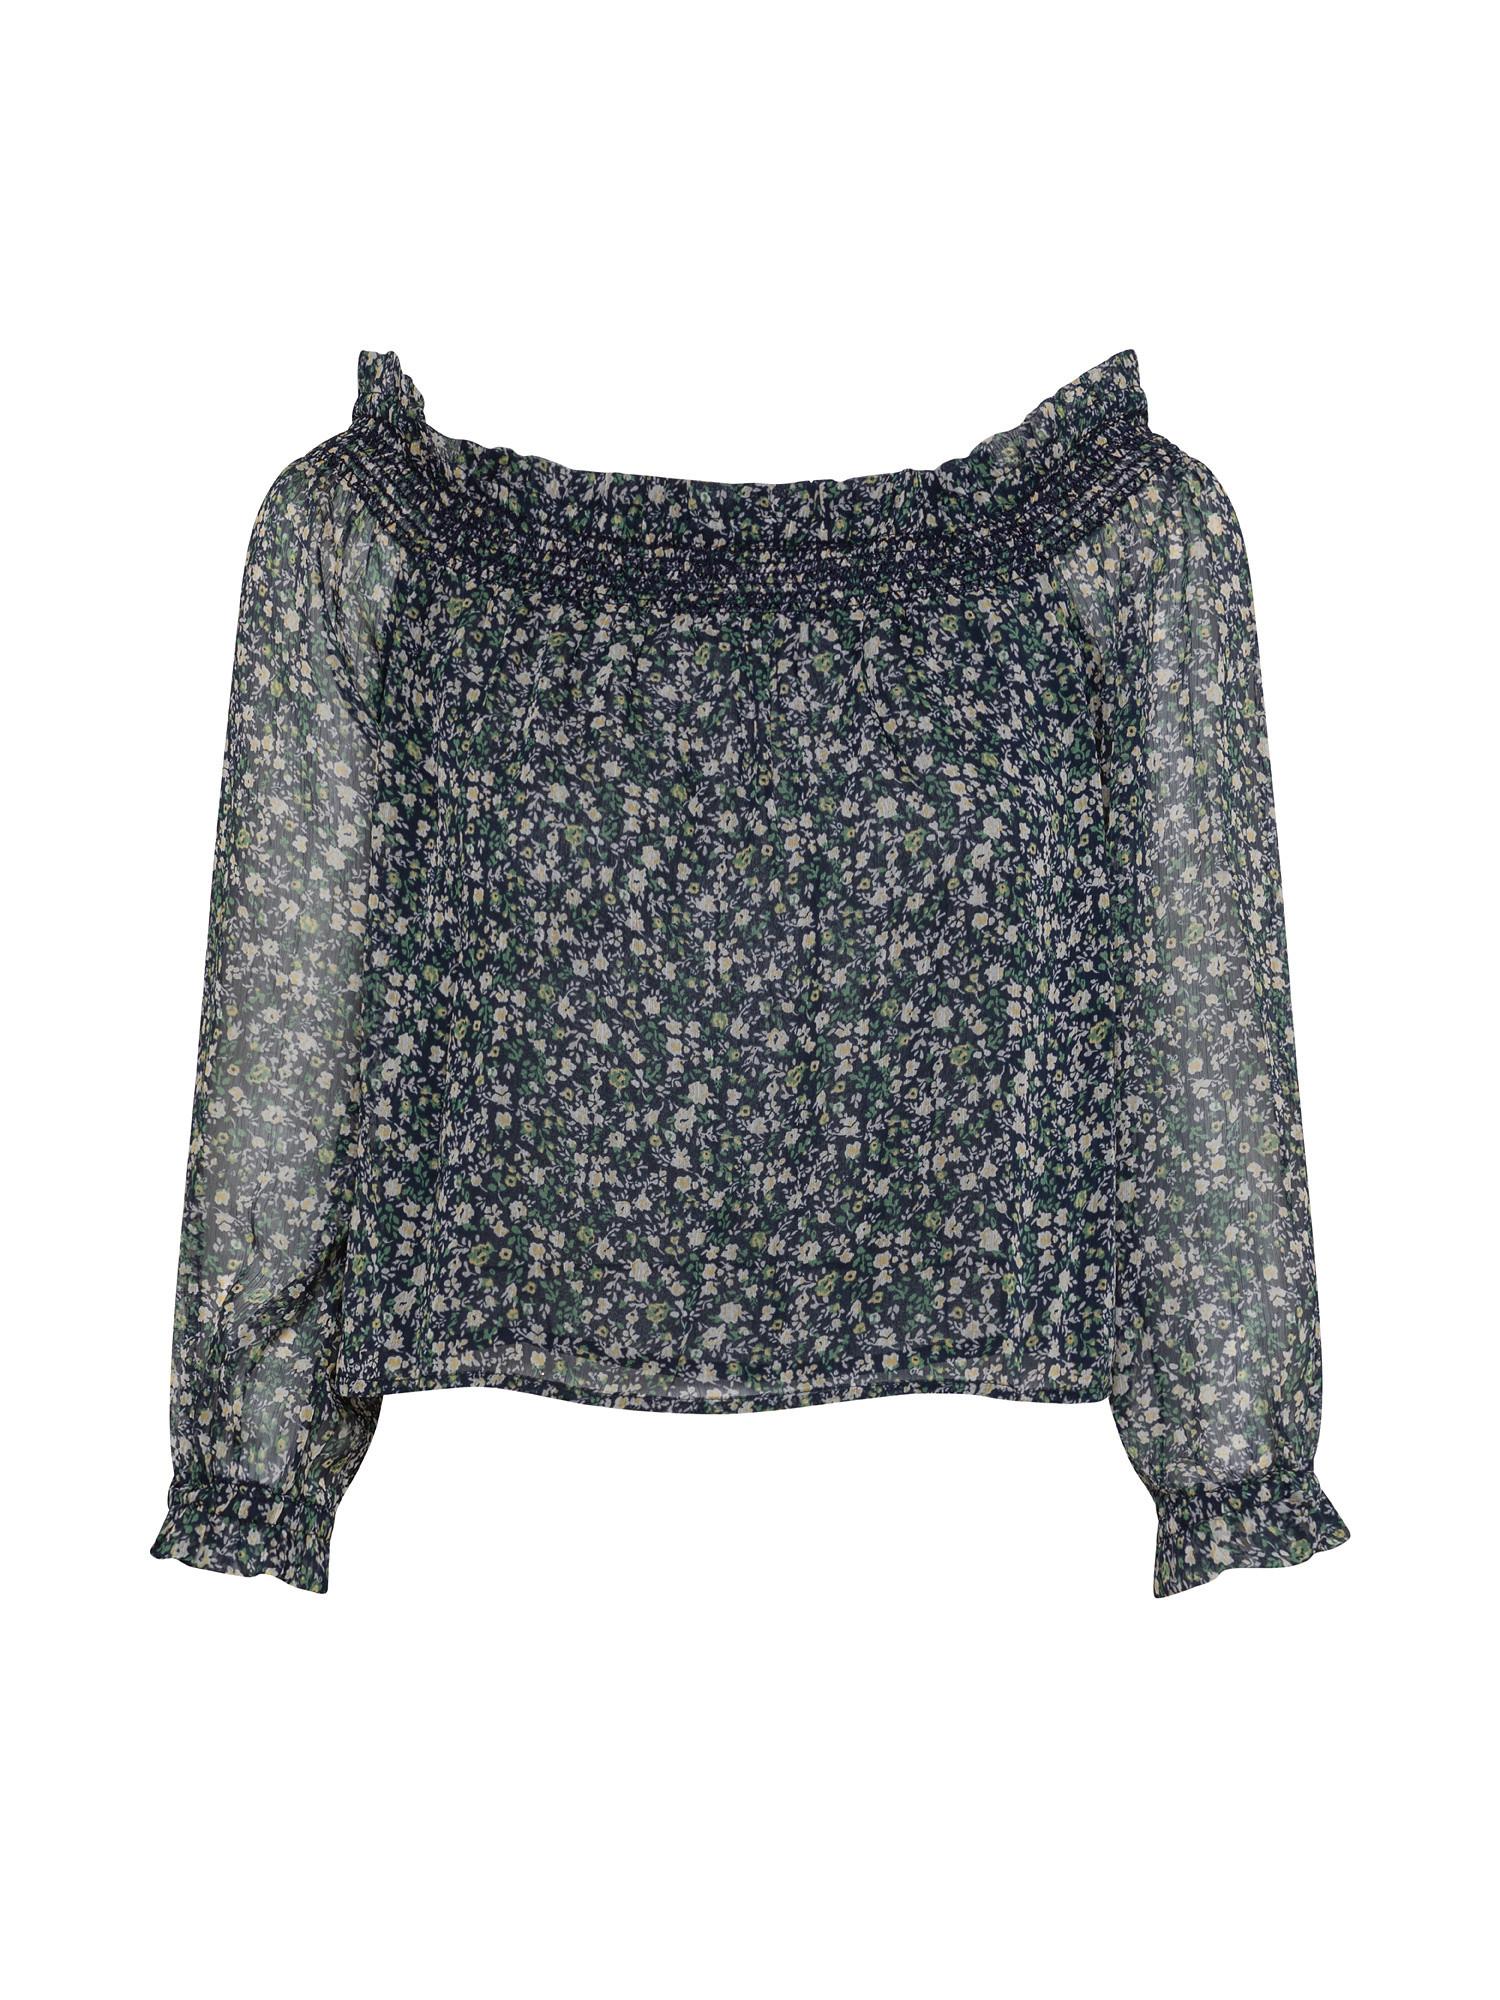 Blusa senza spalle Louise, Multicolor, large image number 0